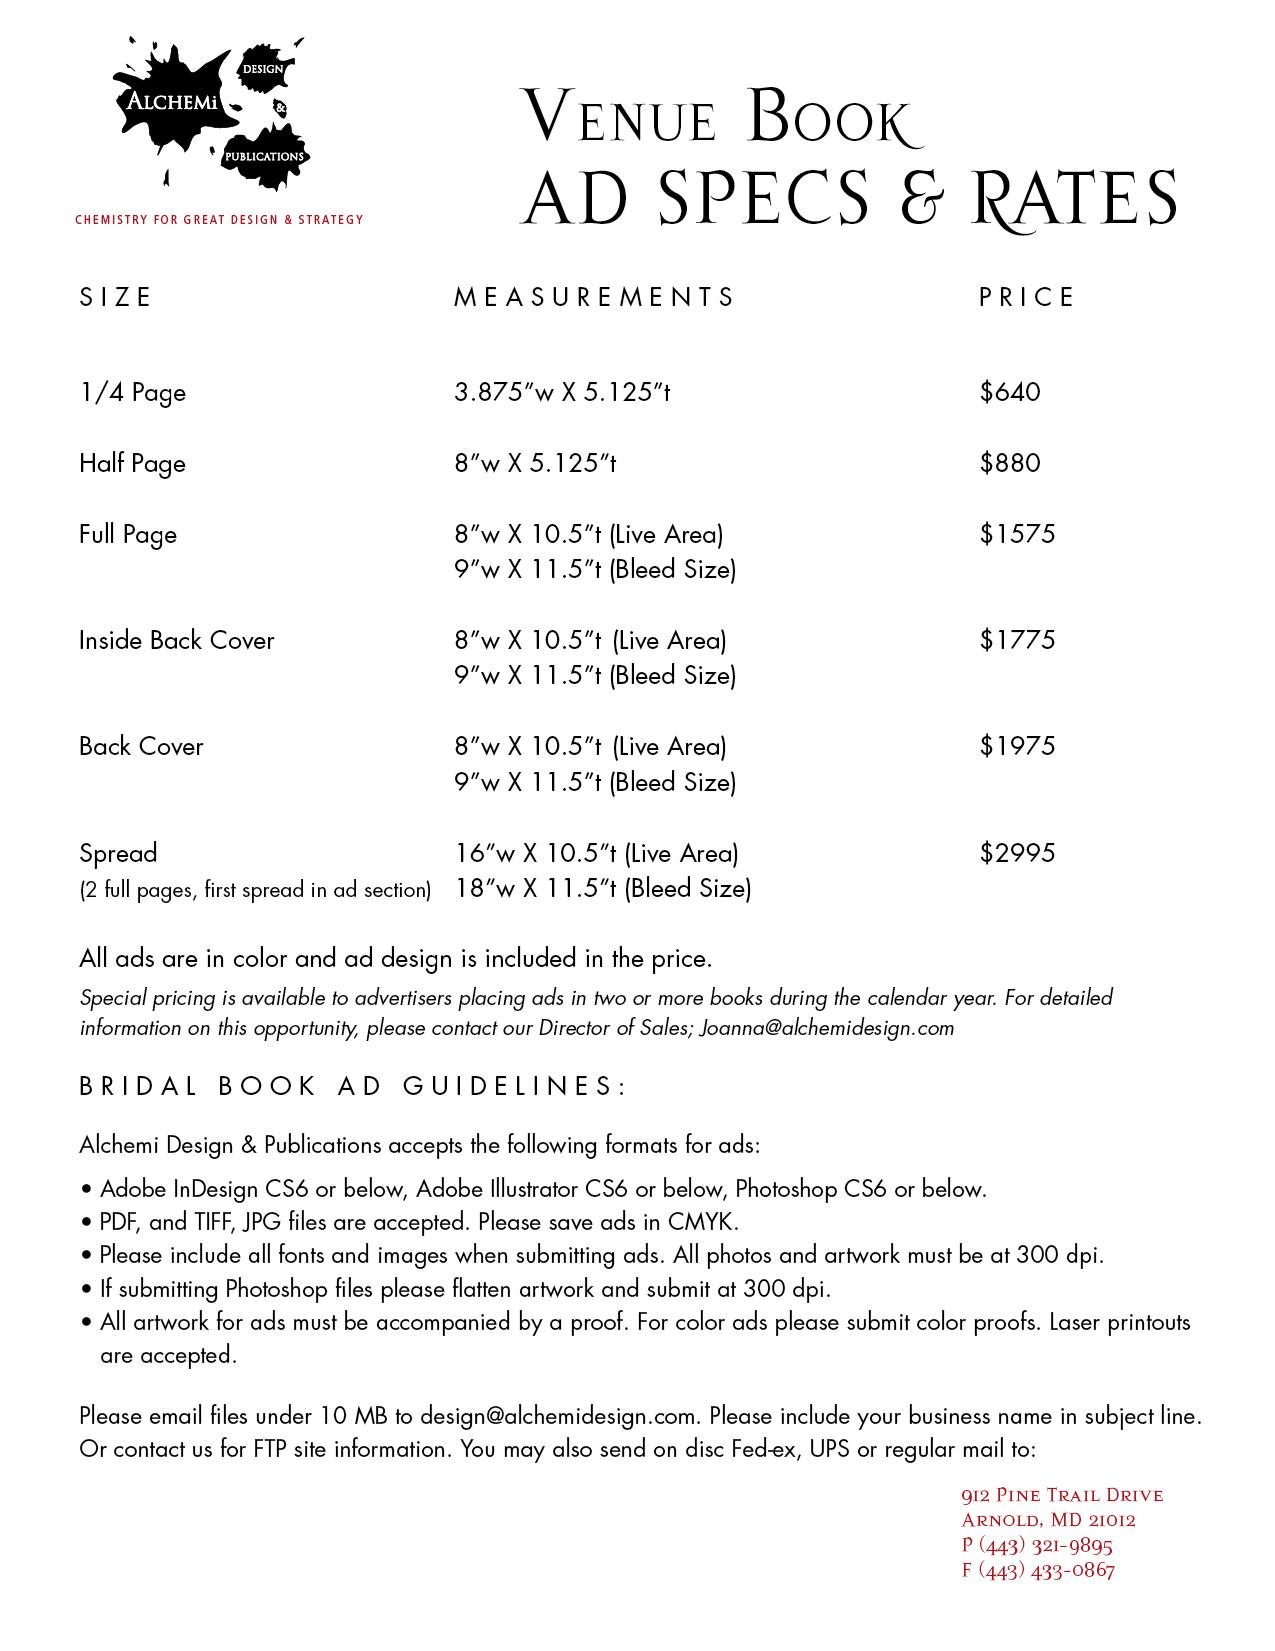 Ad Specs & Rates